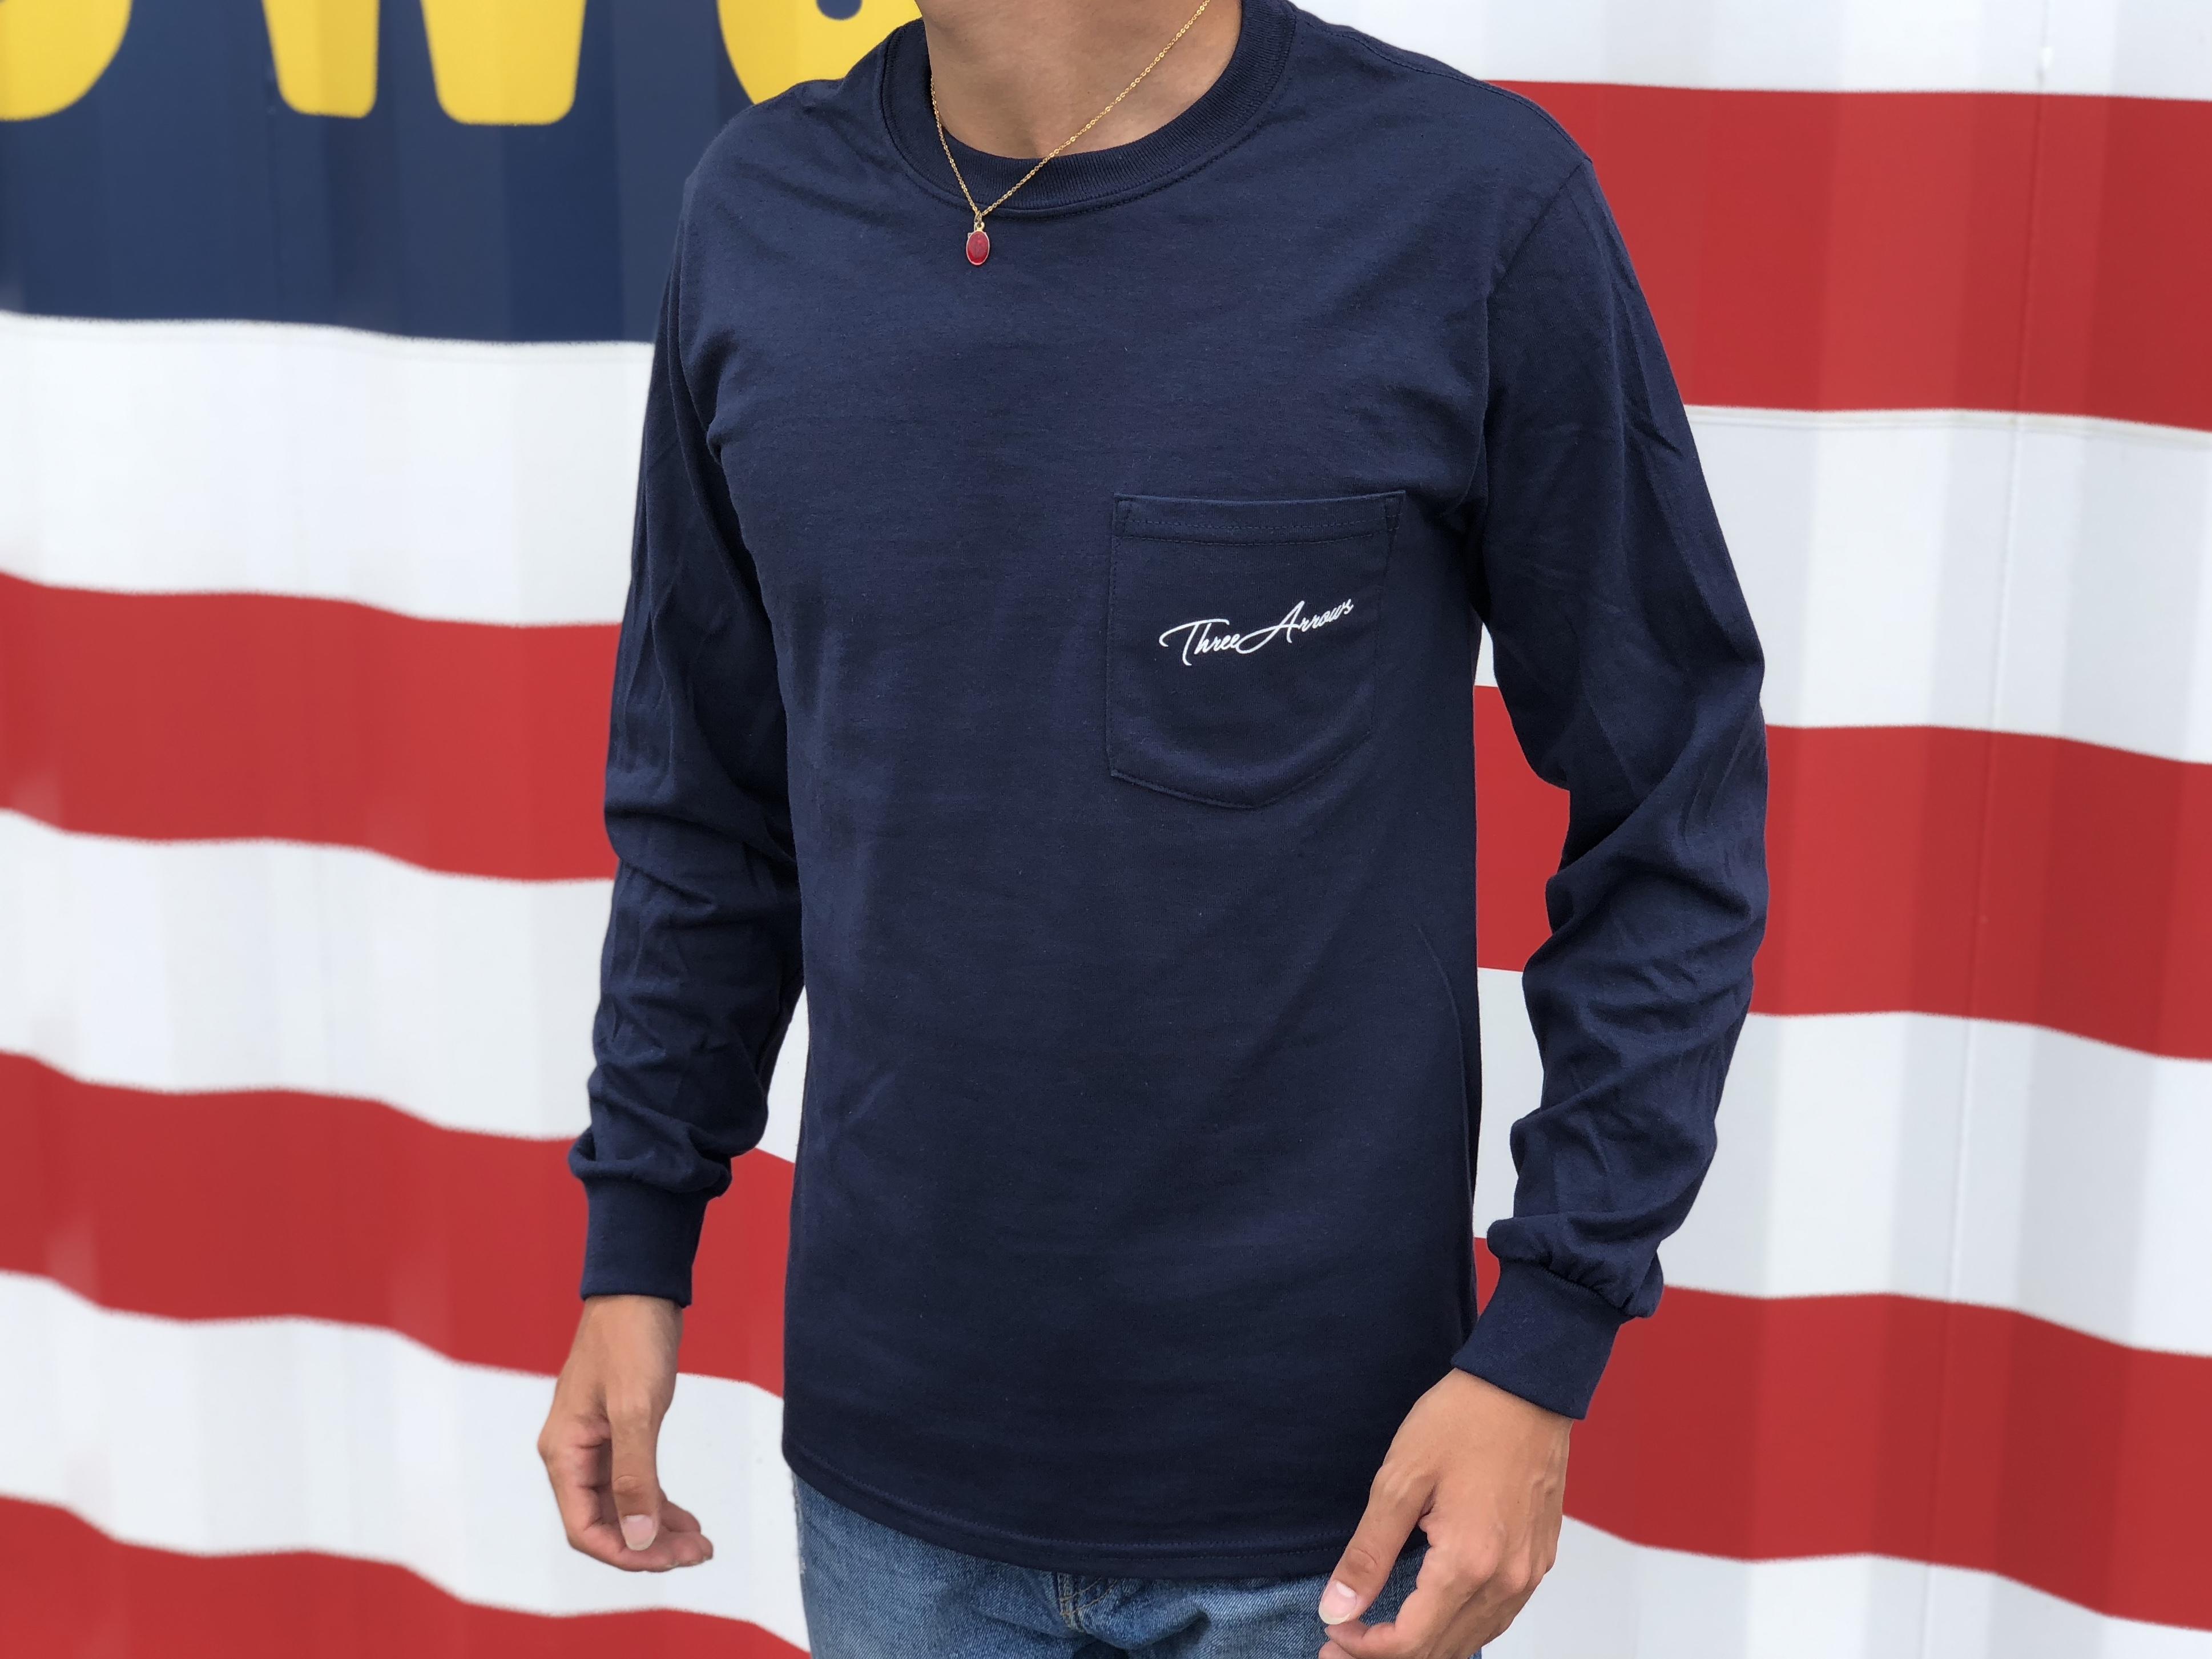 ThreeArrows ポケット付きロングTシャツ(navy)